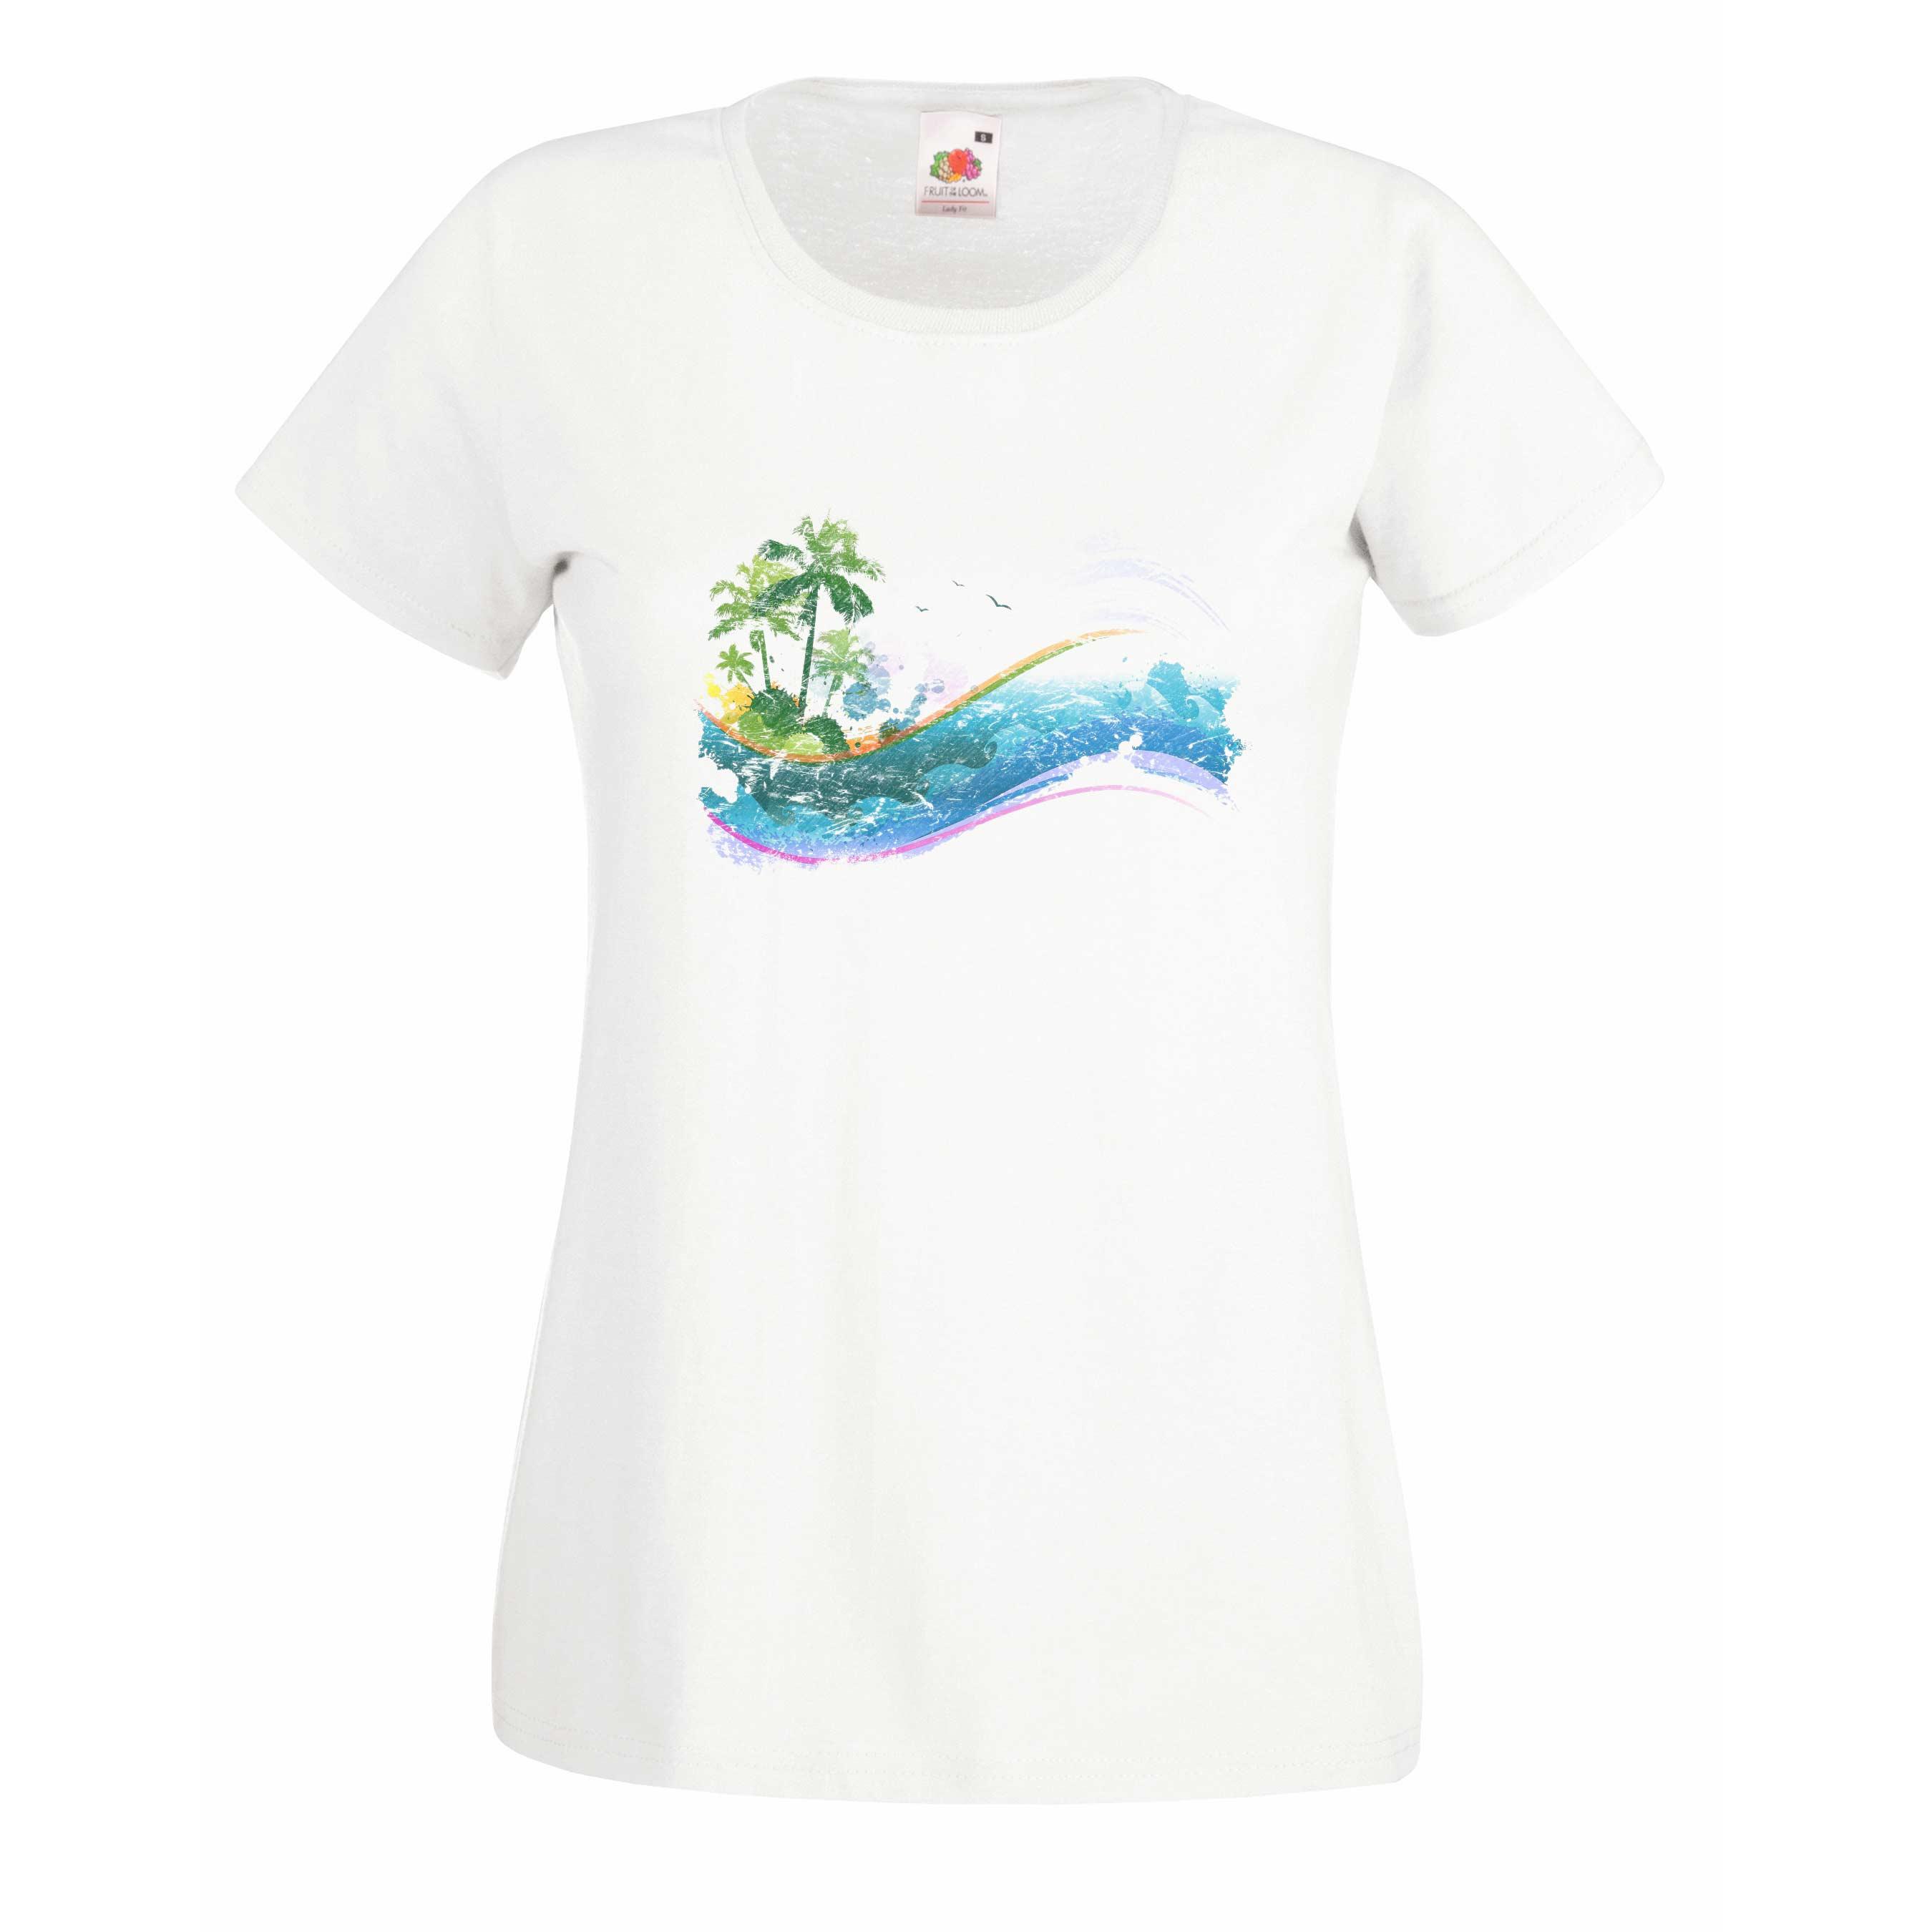 Paradise design for t-shirt, hoodie & sweatshirt